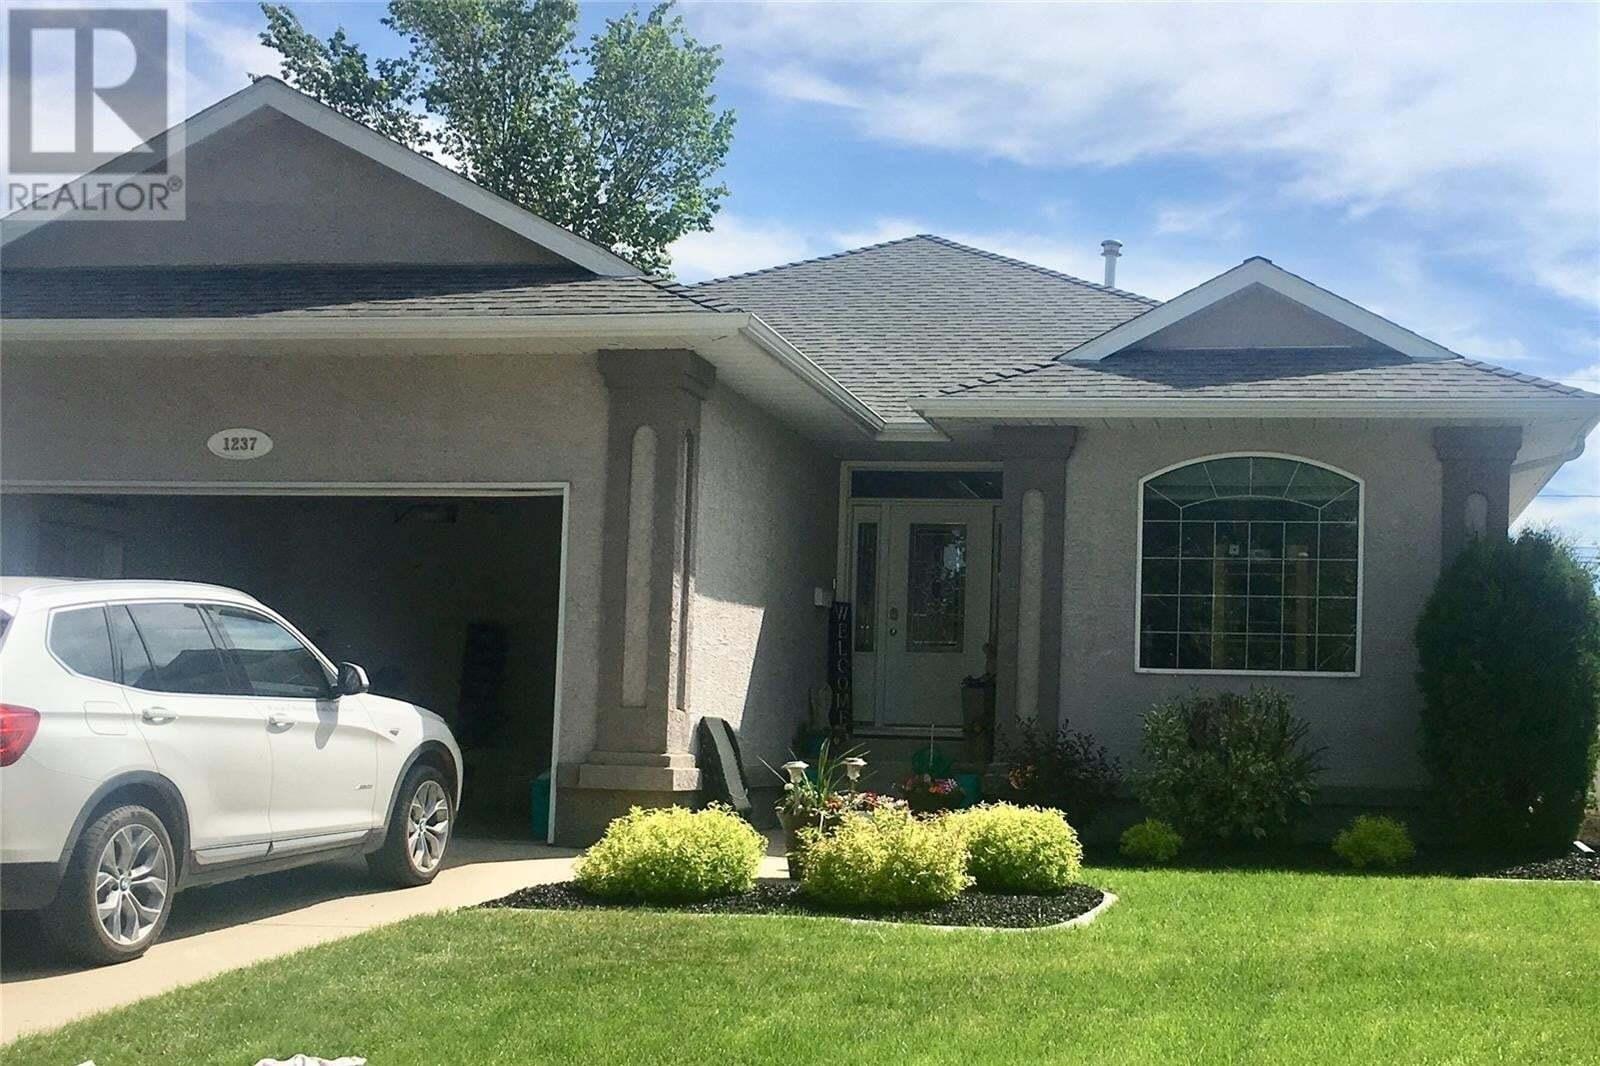 House for sale at 1237 Grafton Ave Moose Jaw Saskatchewan - MLS: SK814315